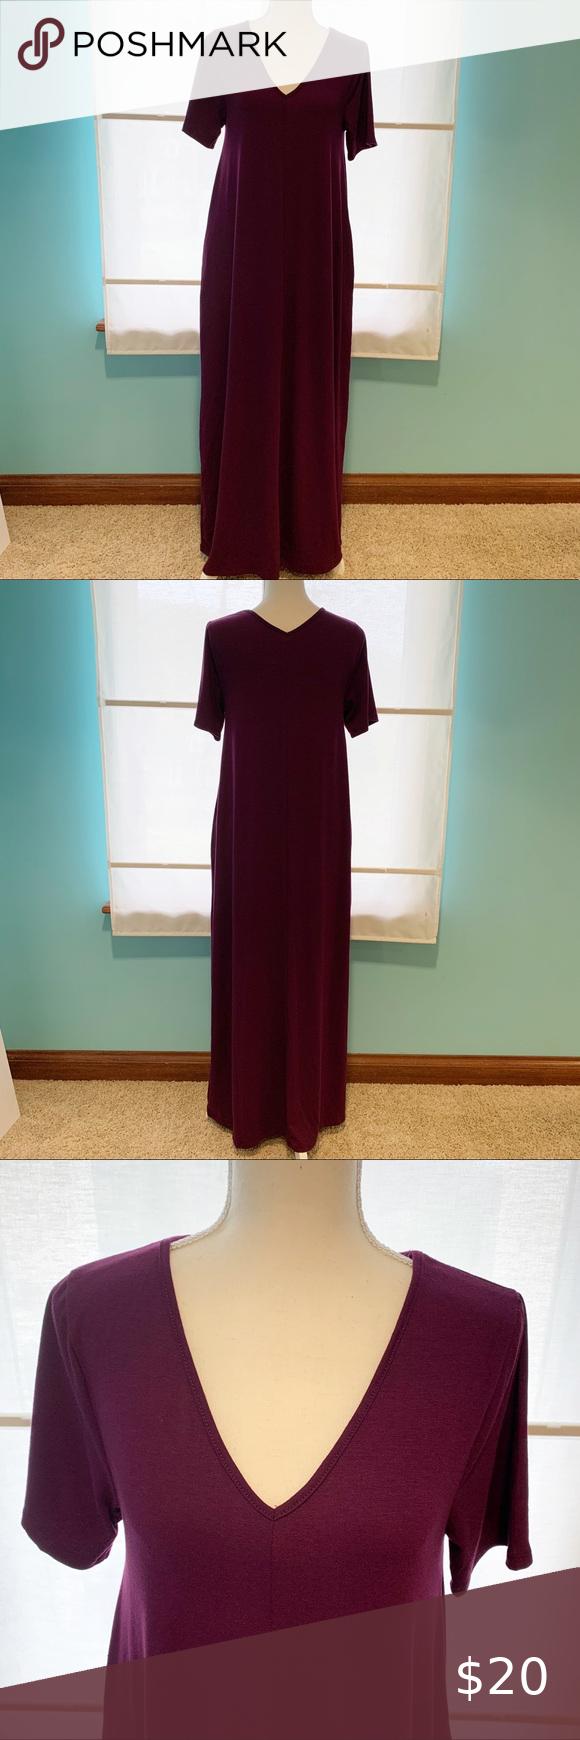 Maxi Dress Nwot Shirt Dress Style Maxi Dress Tshirt Style [ 1740 x 580 Pixel ]